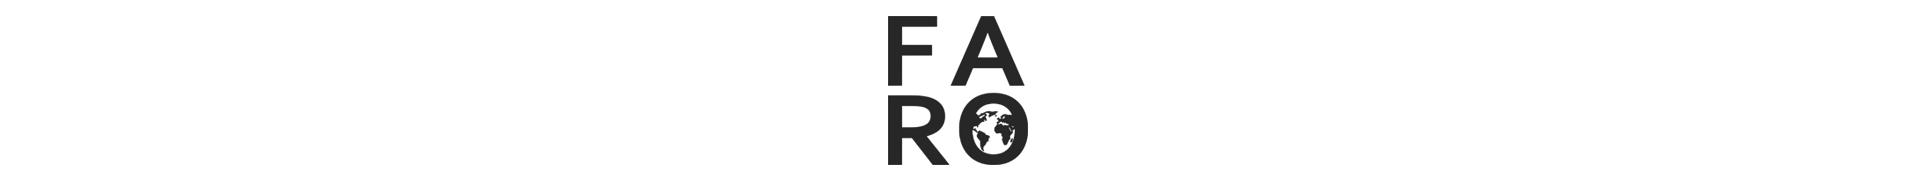 FARO.design header image containing the logo for web.